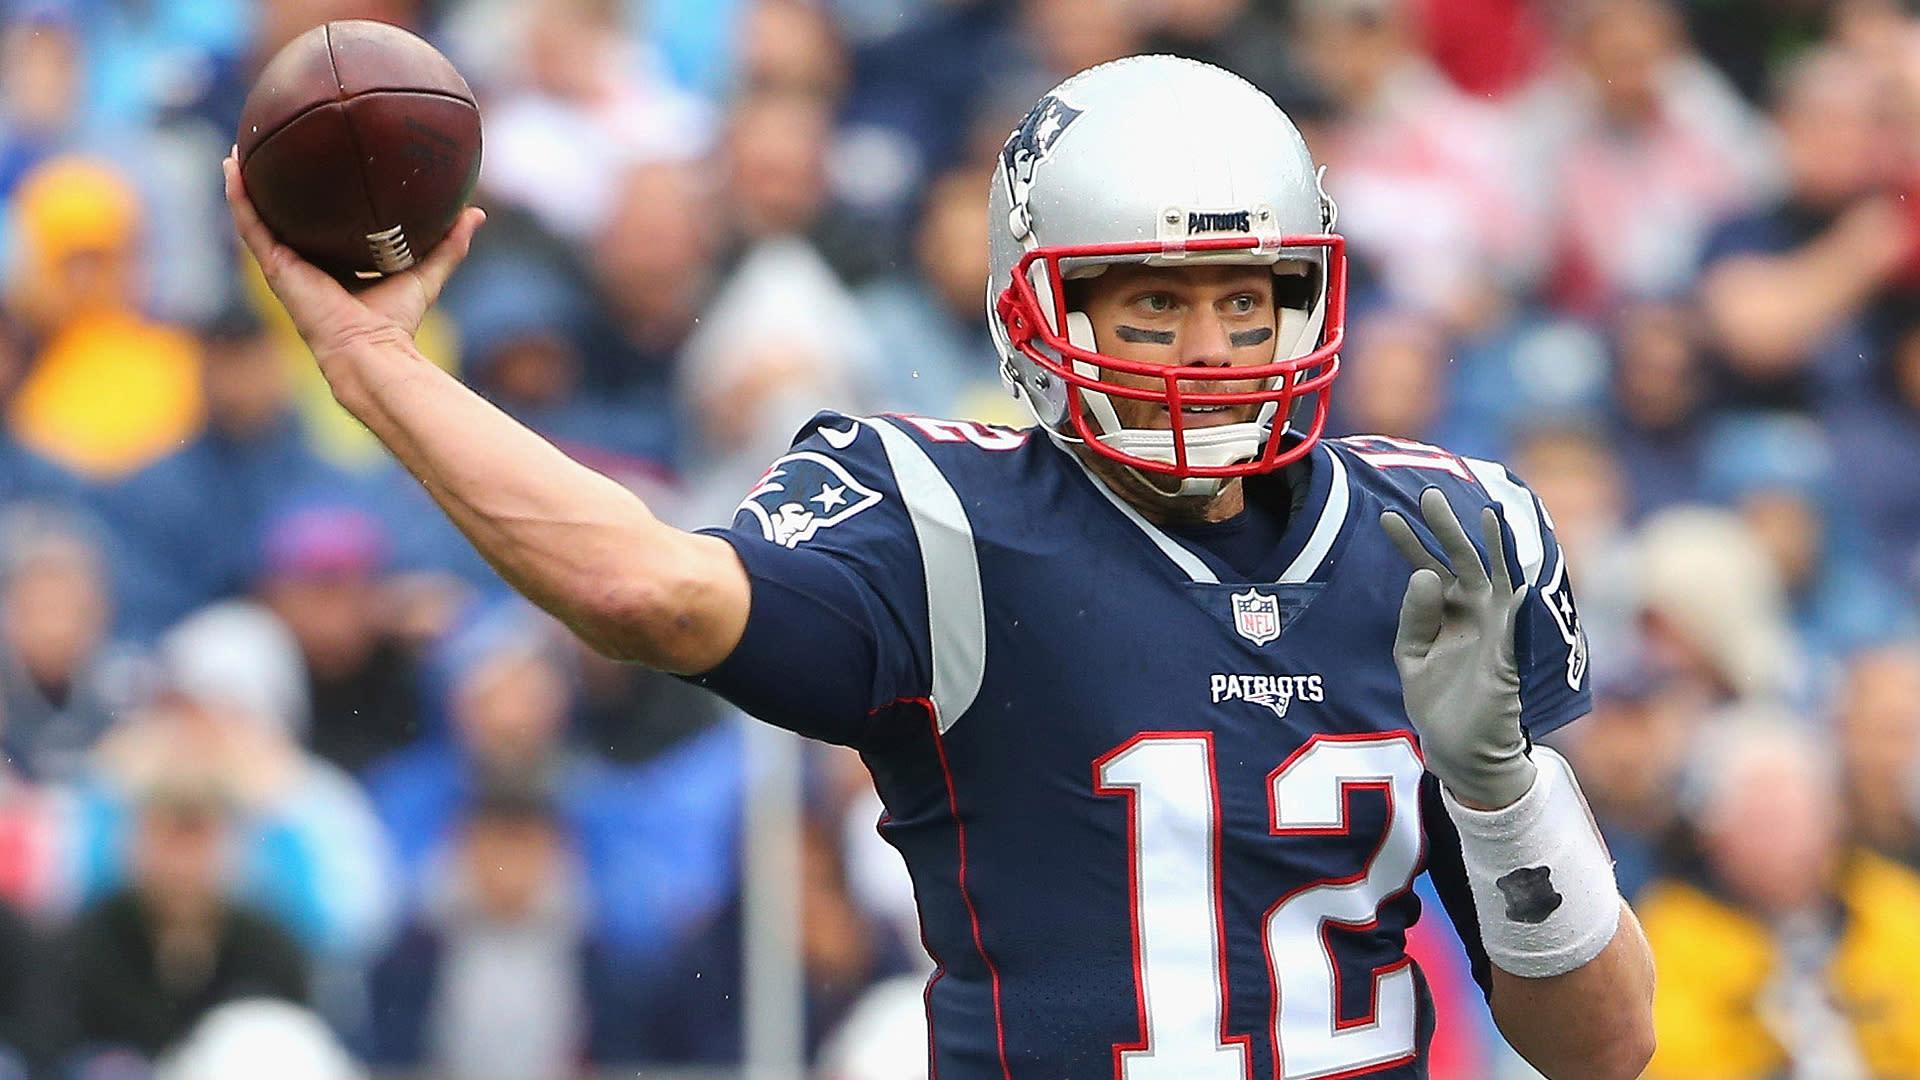 Patriots quarterback Tom Brady may be fantasy dud vs. Bills